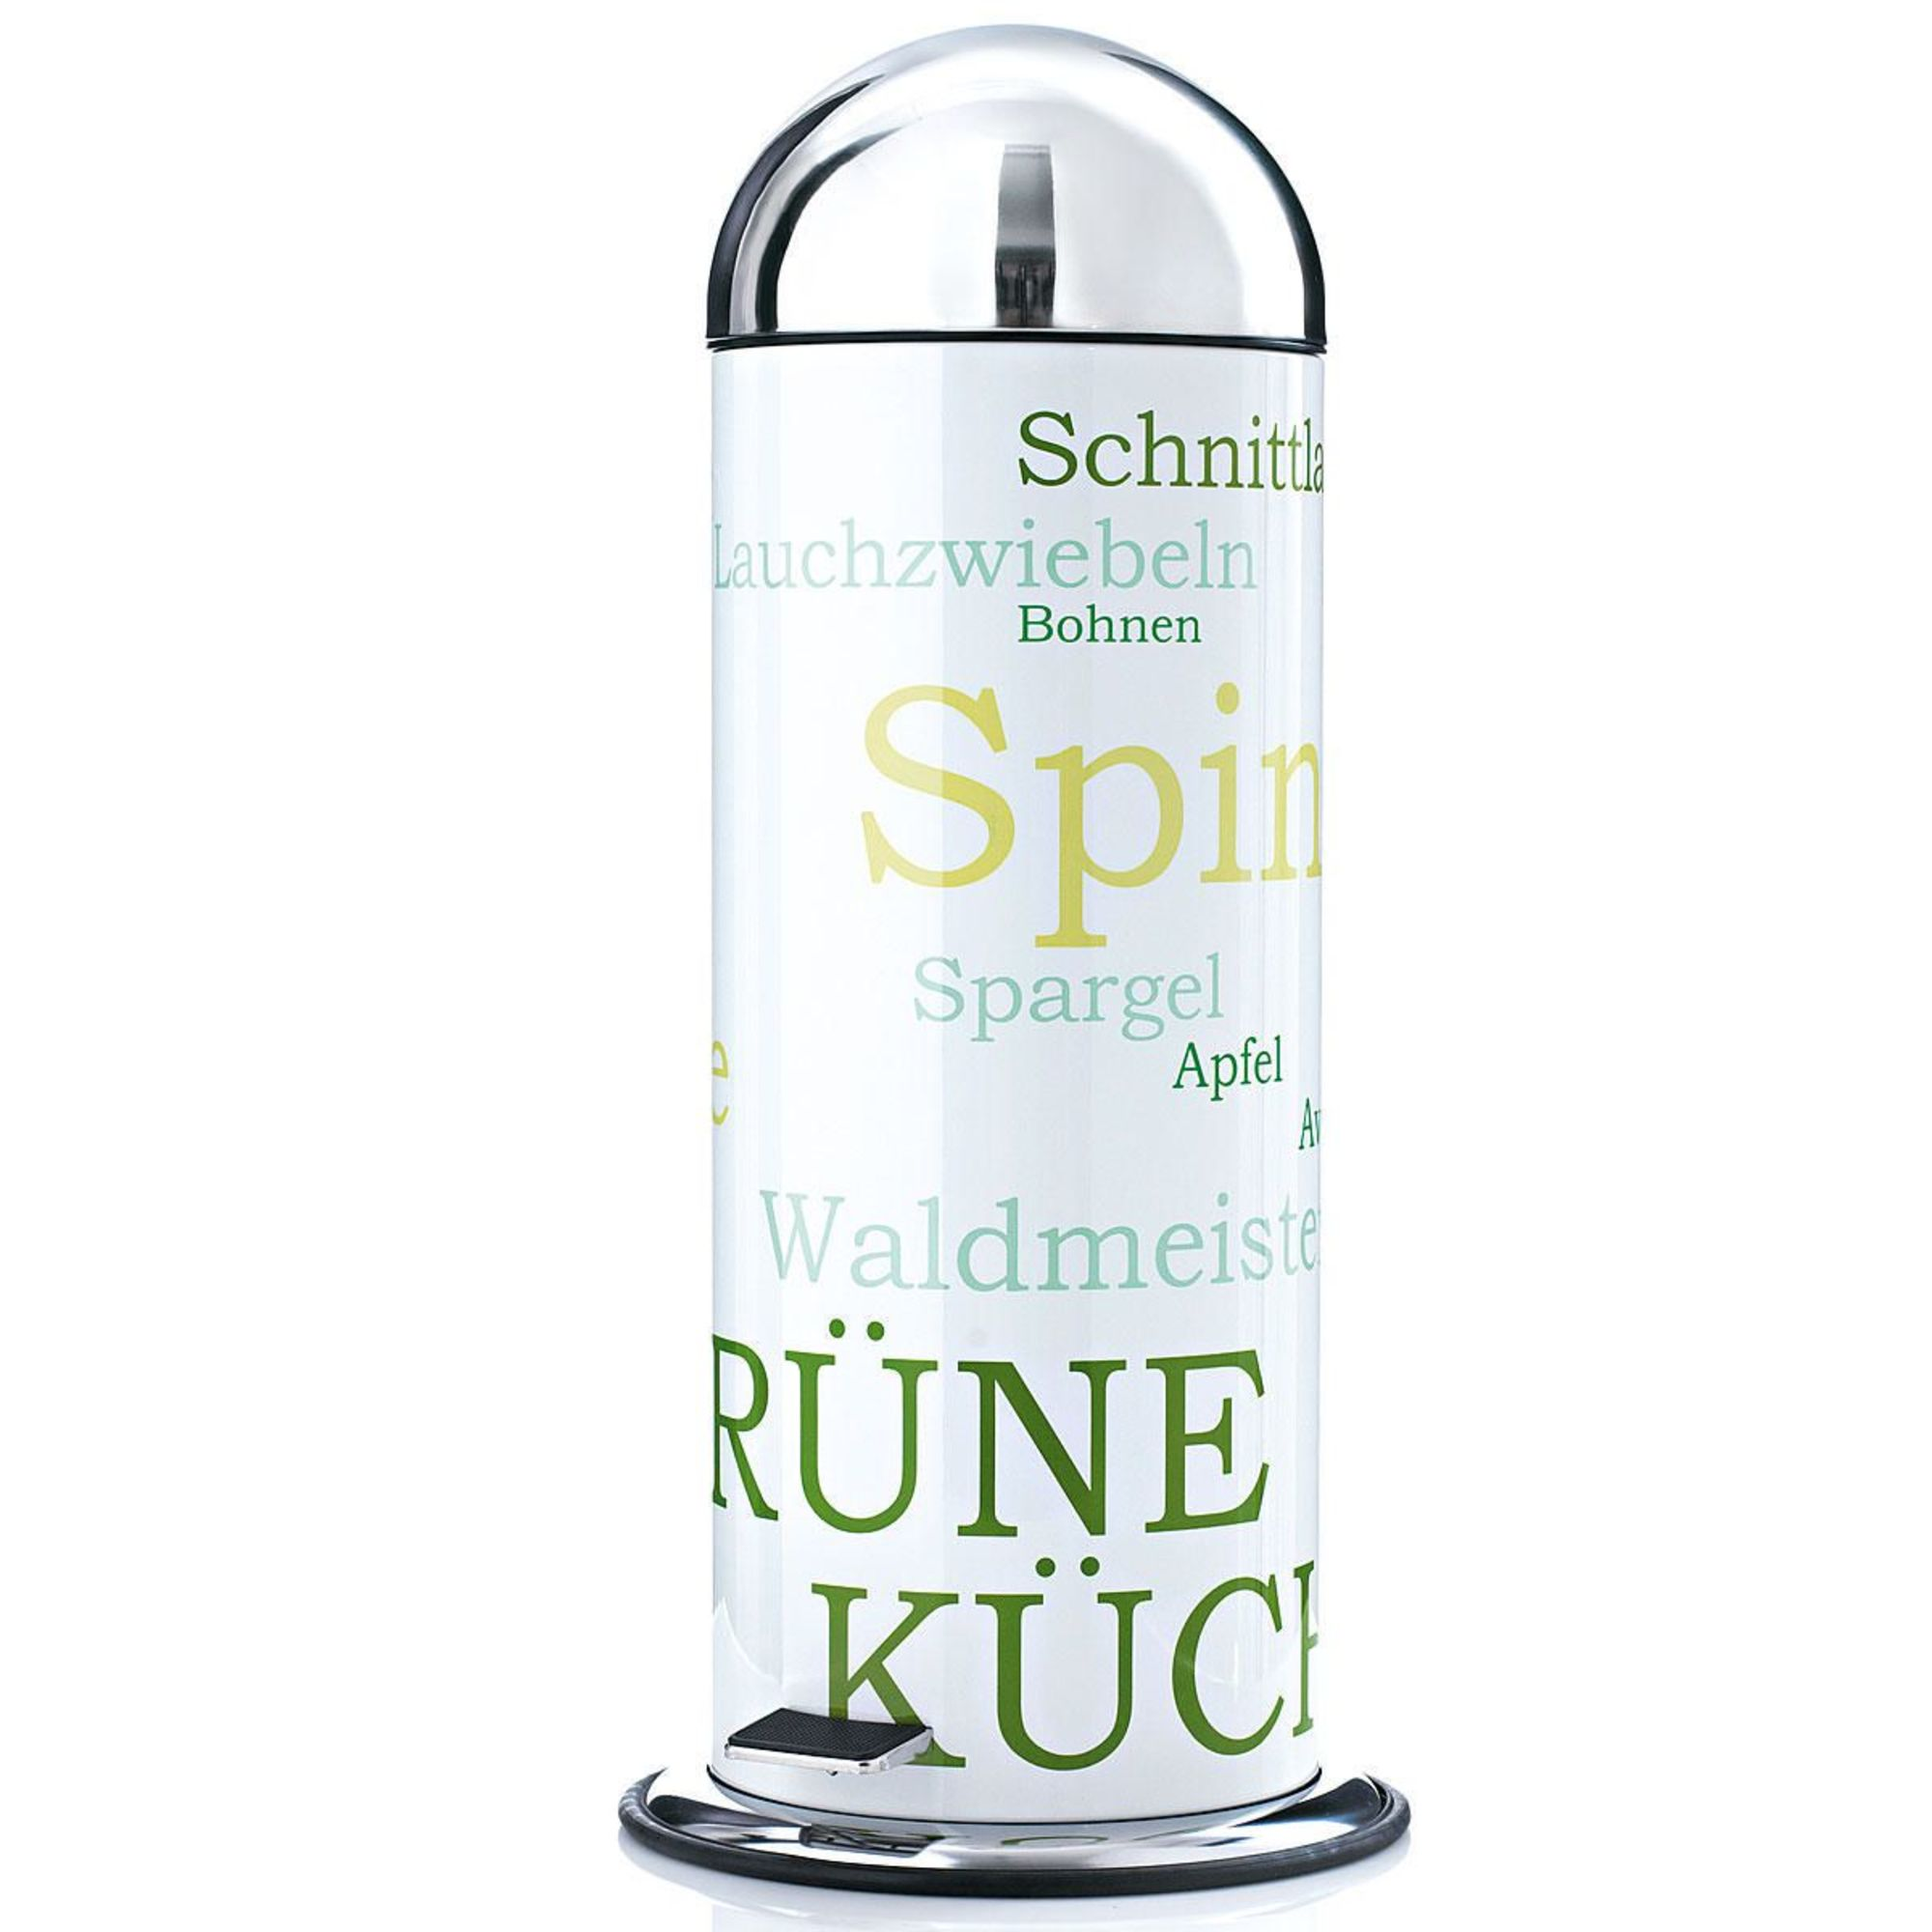 Mülleimer, ca. 20 Liter Fassungsvermögen, Pedal, Edelstahl ...